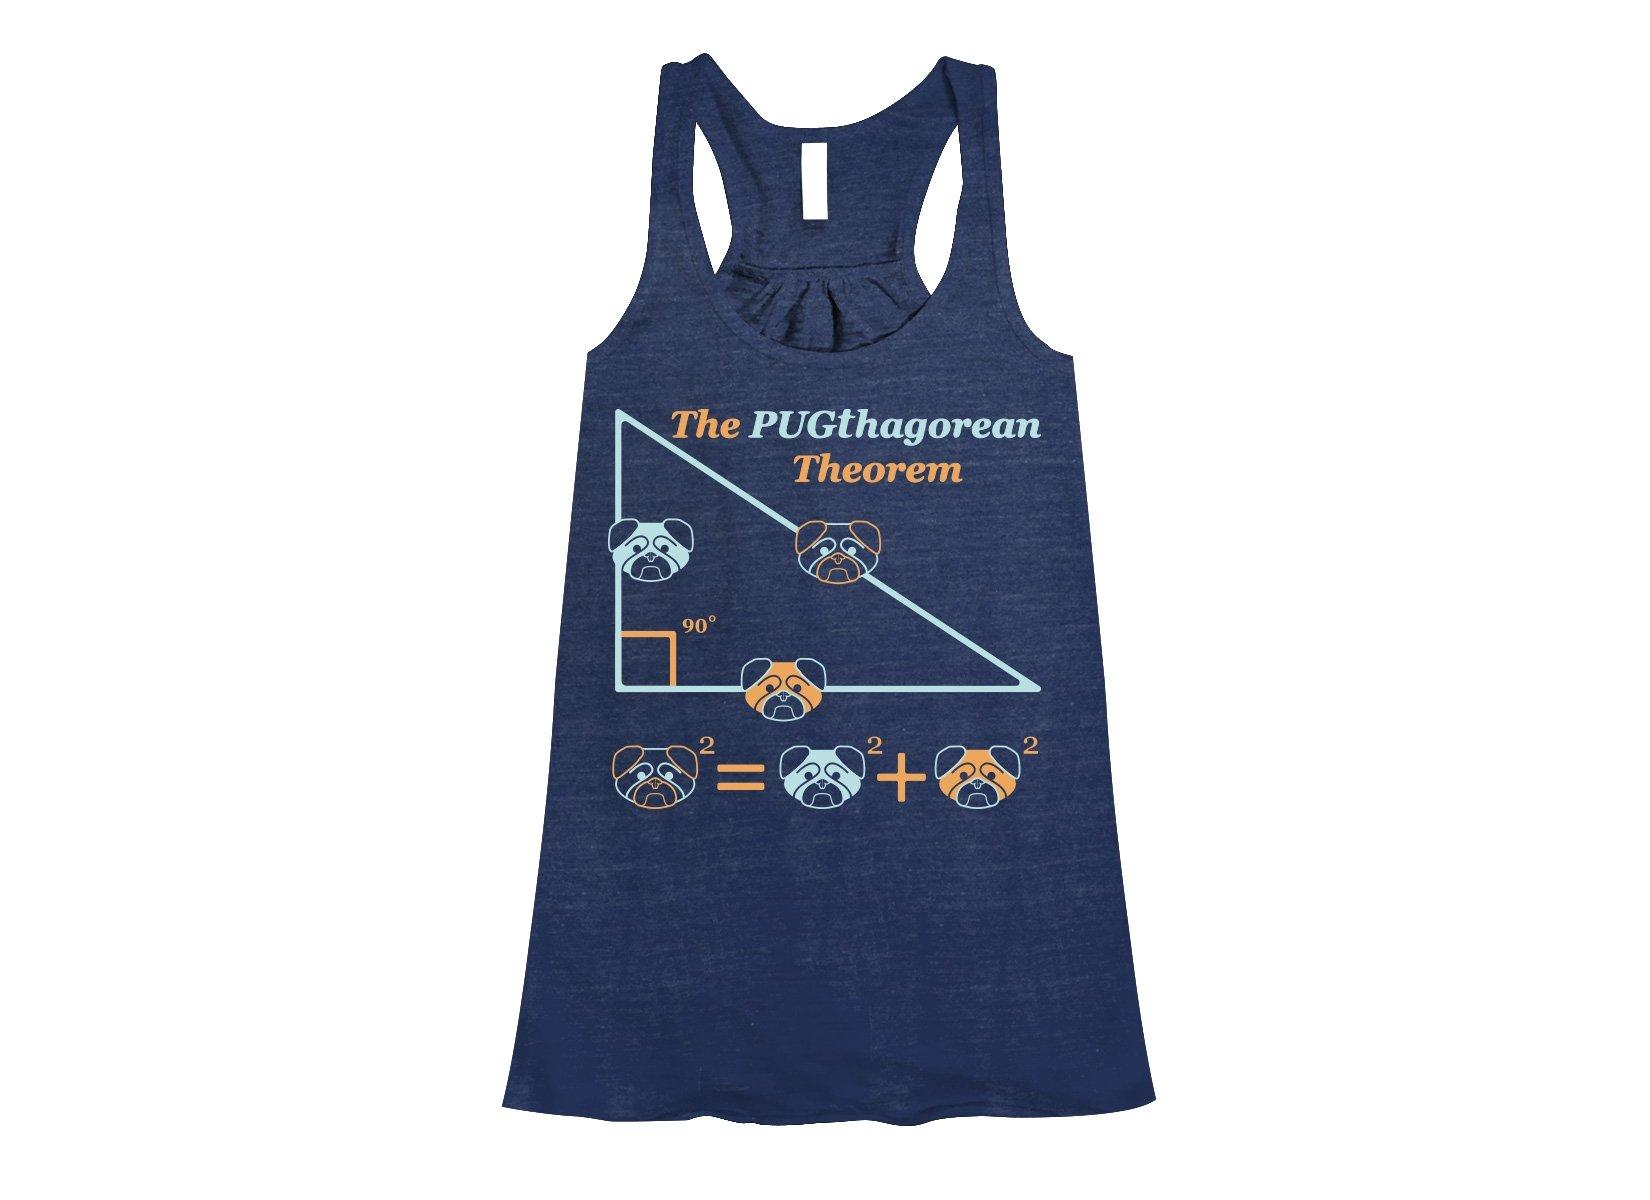 Pugthagorean Theorem on Womens Tanks T-Shirt